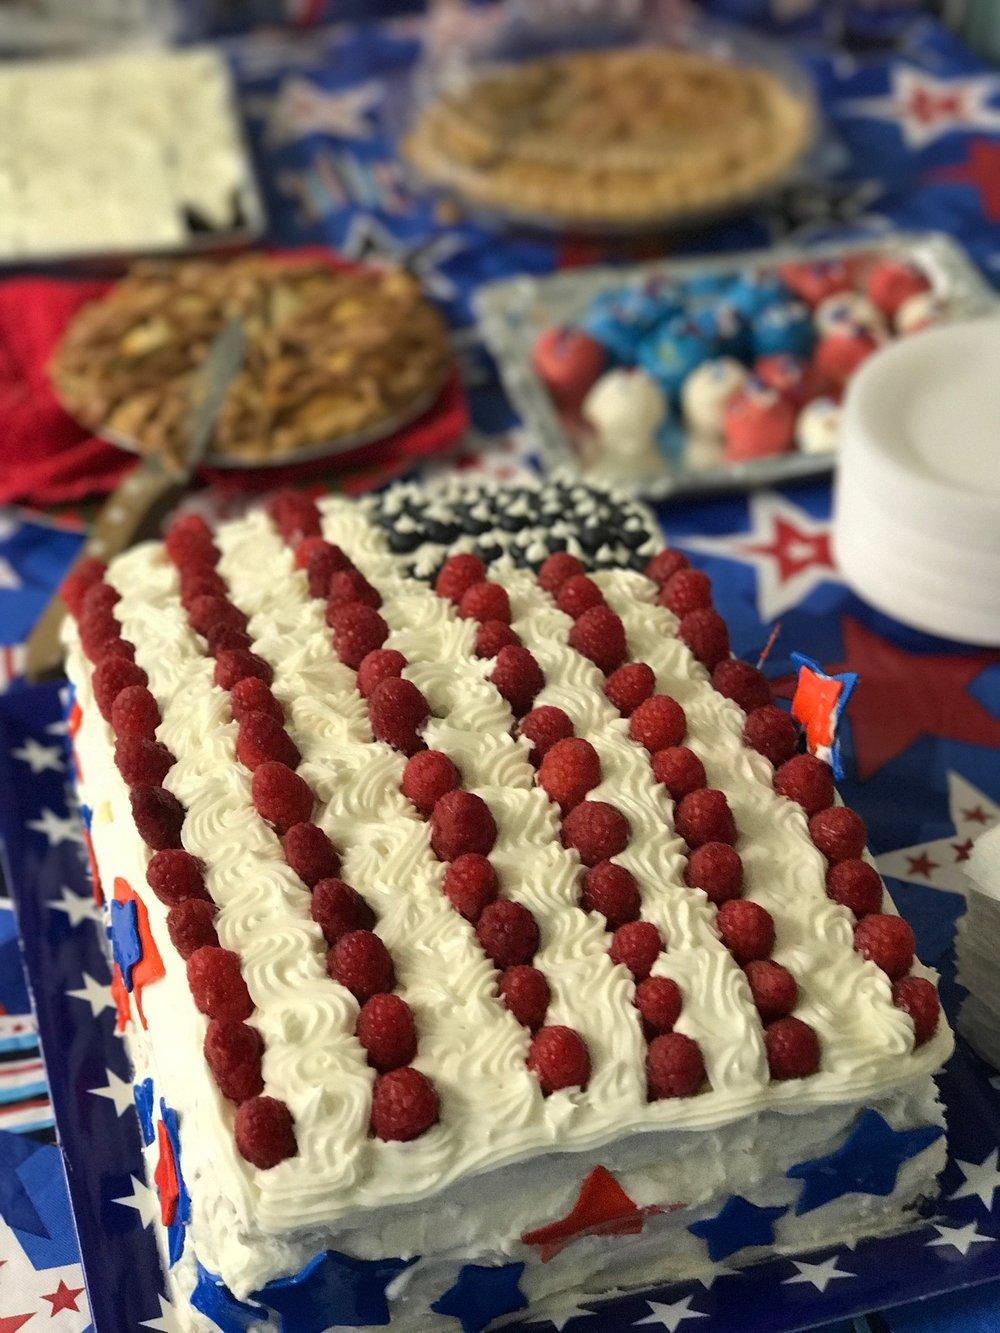 Celebrating the U.S.A.